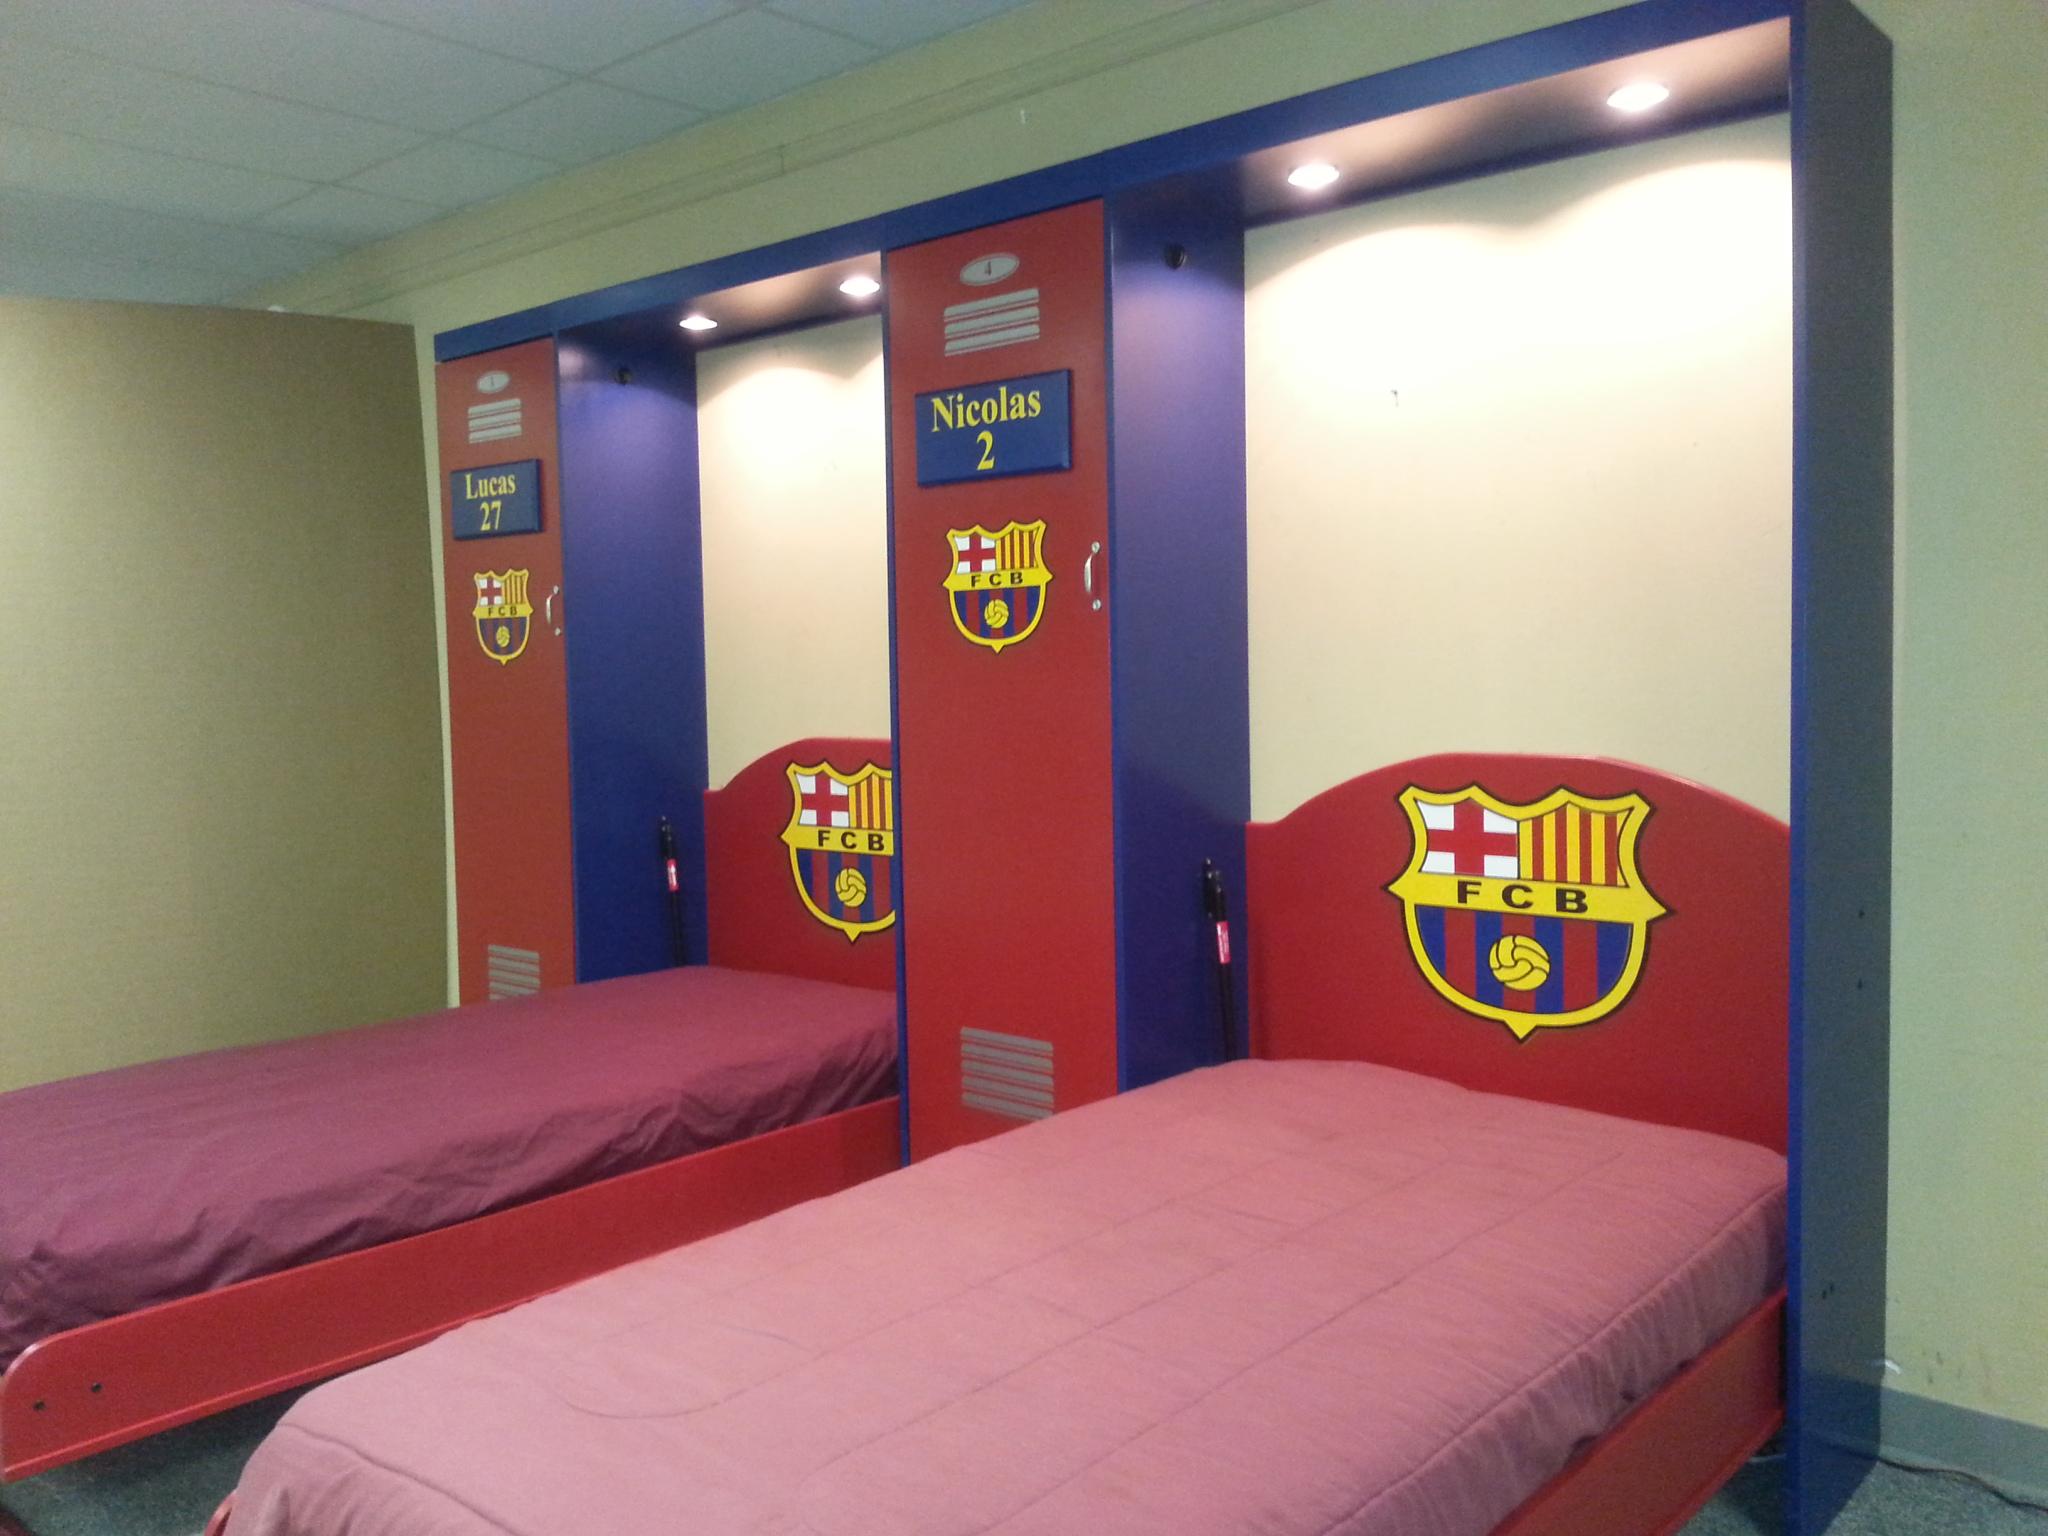 Soccer Murphy bed open